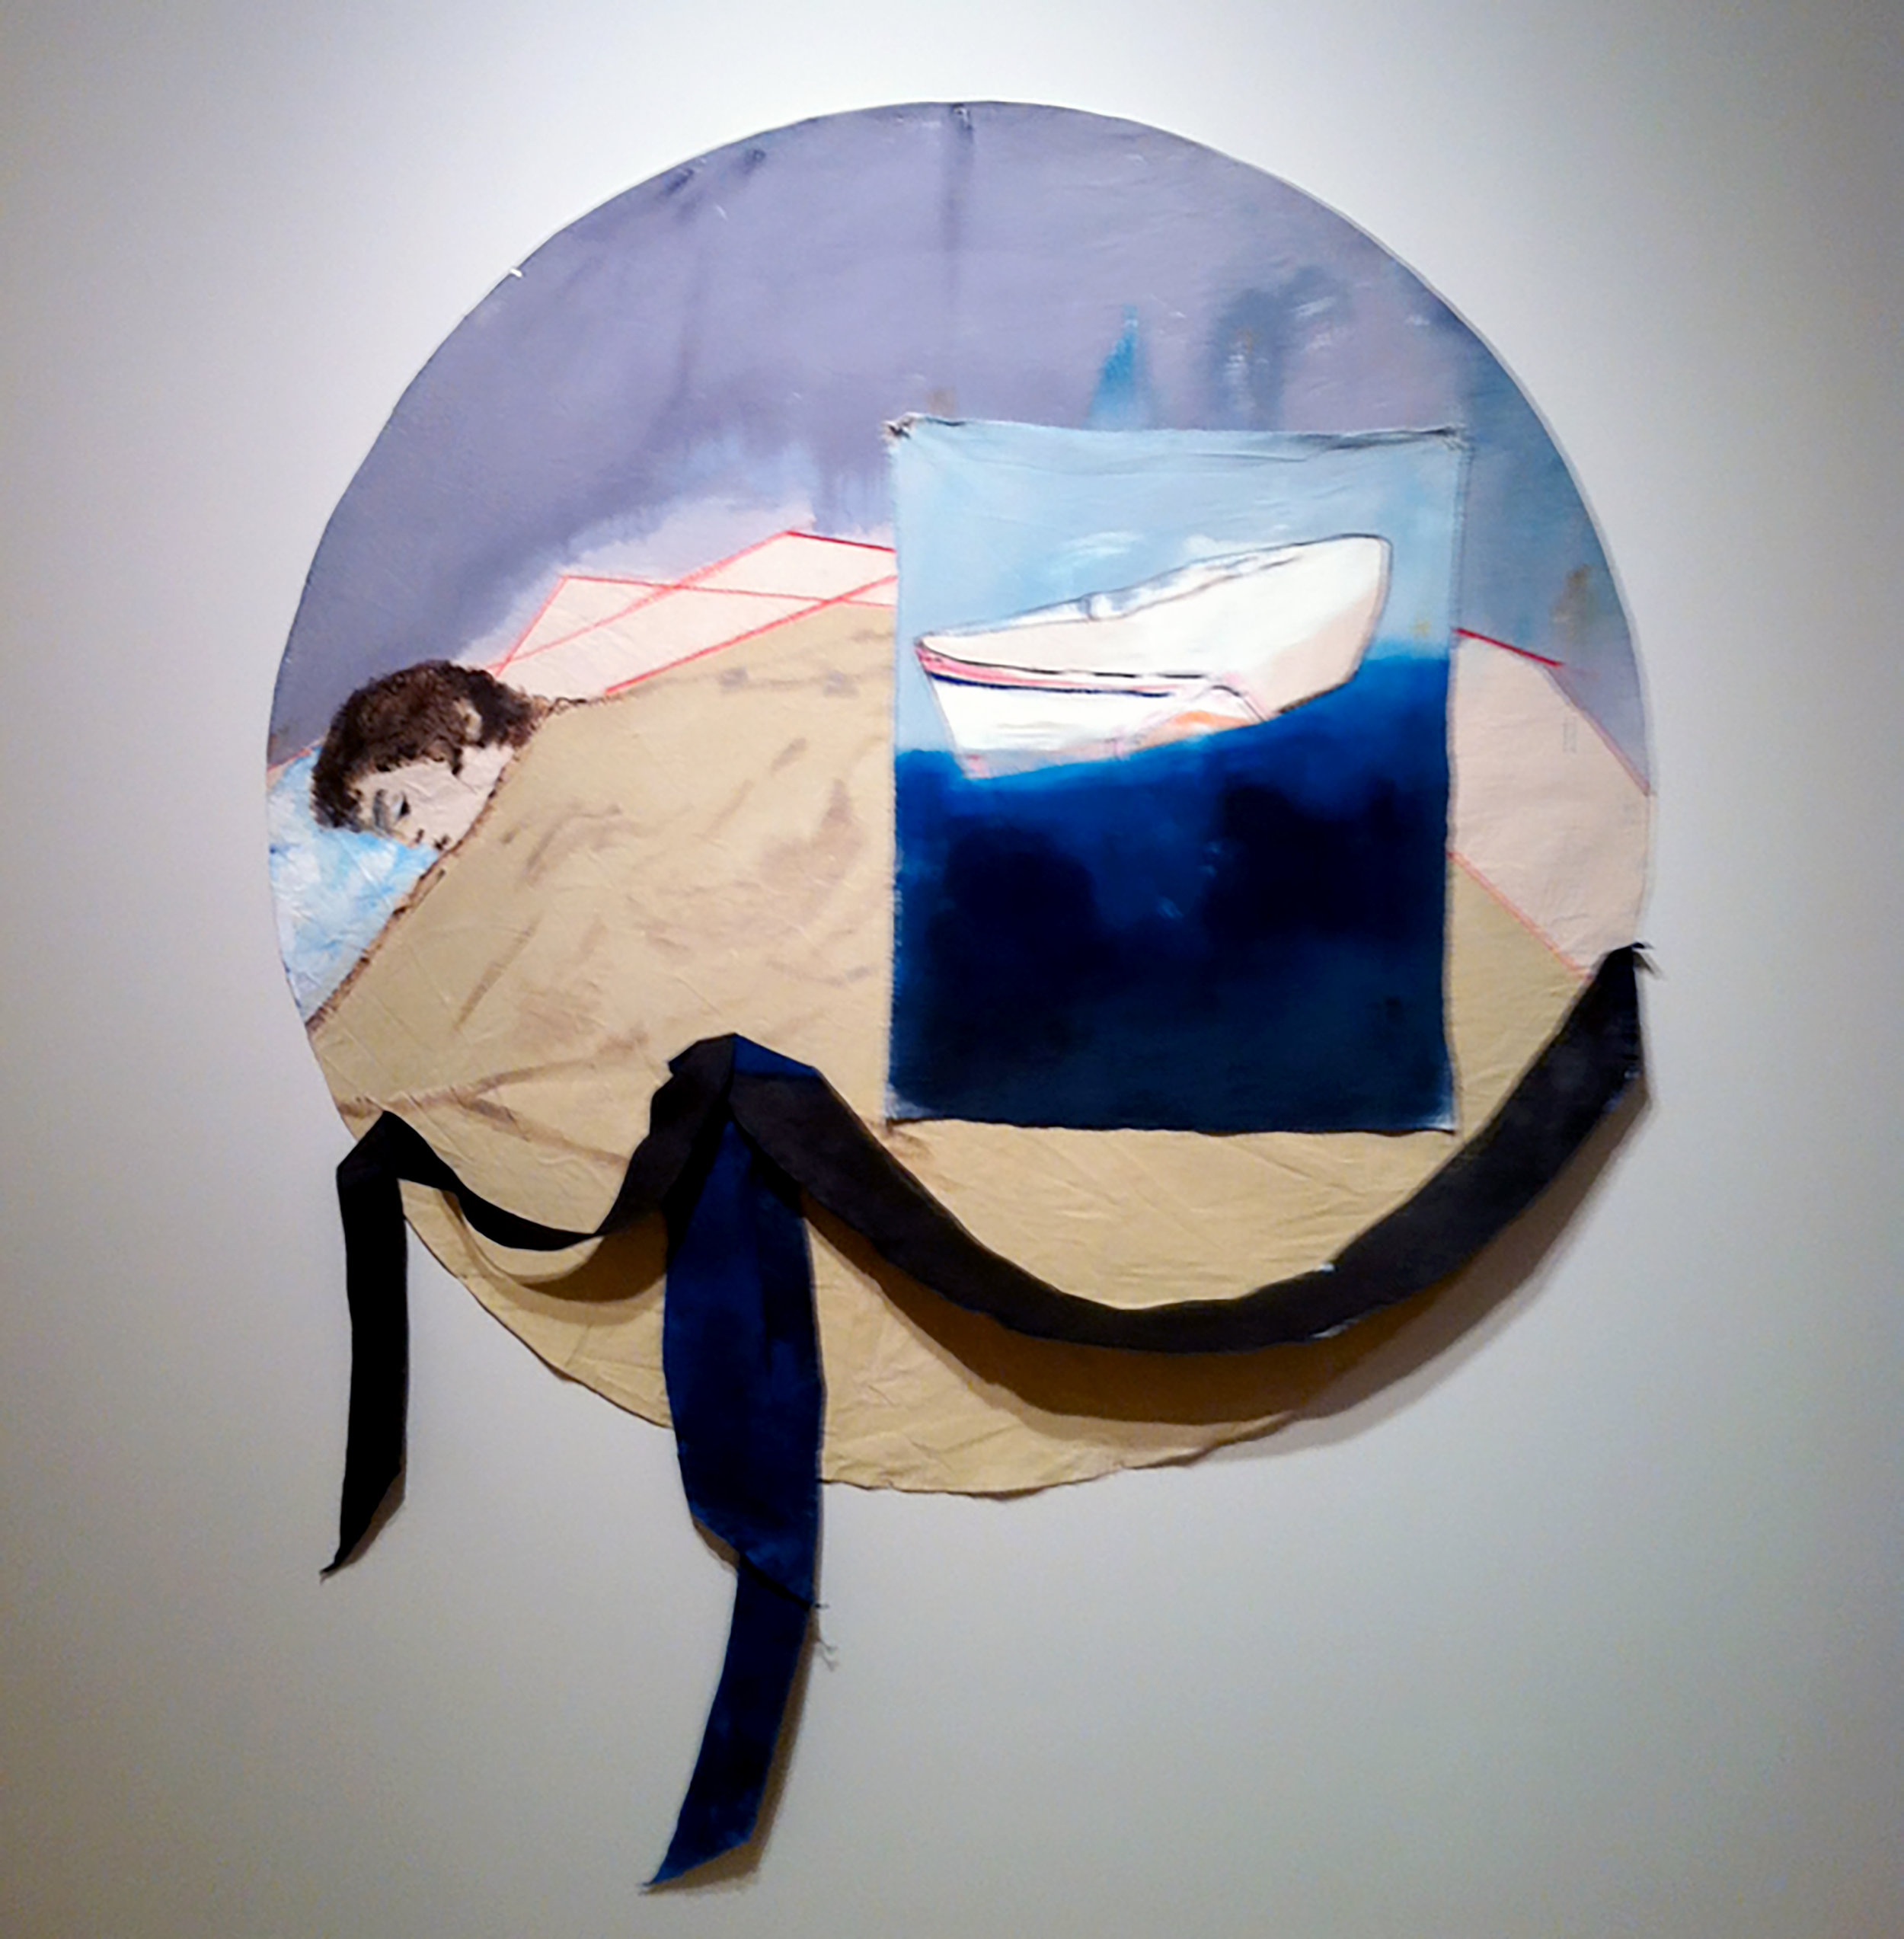 "Jetsam, oil on raw canvas, 72"" diameter, 2014"